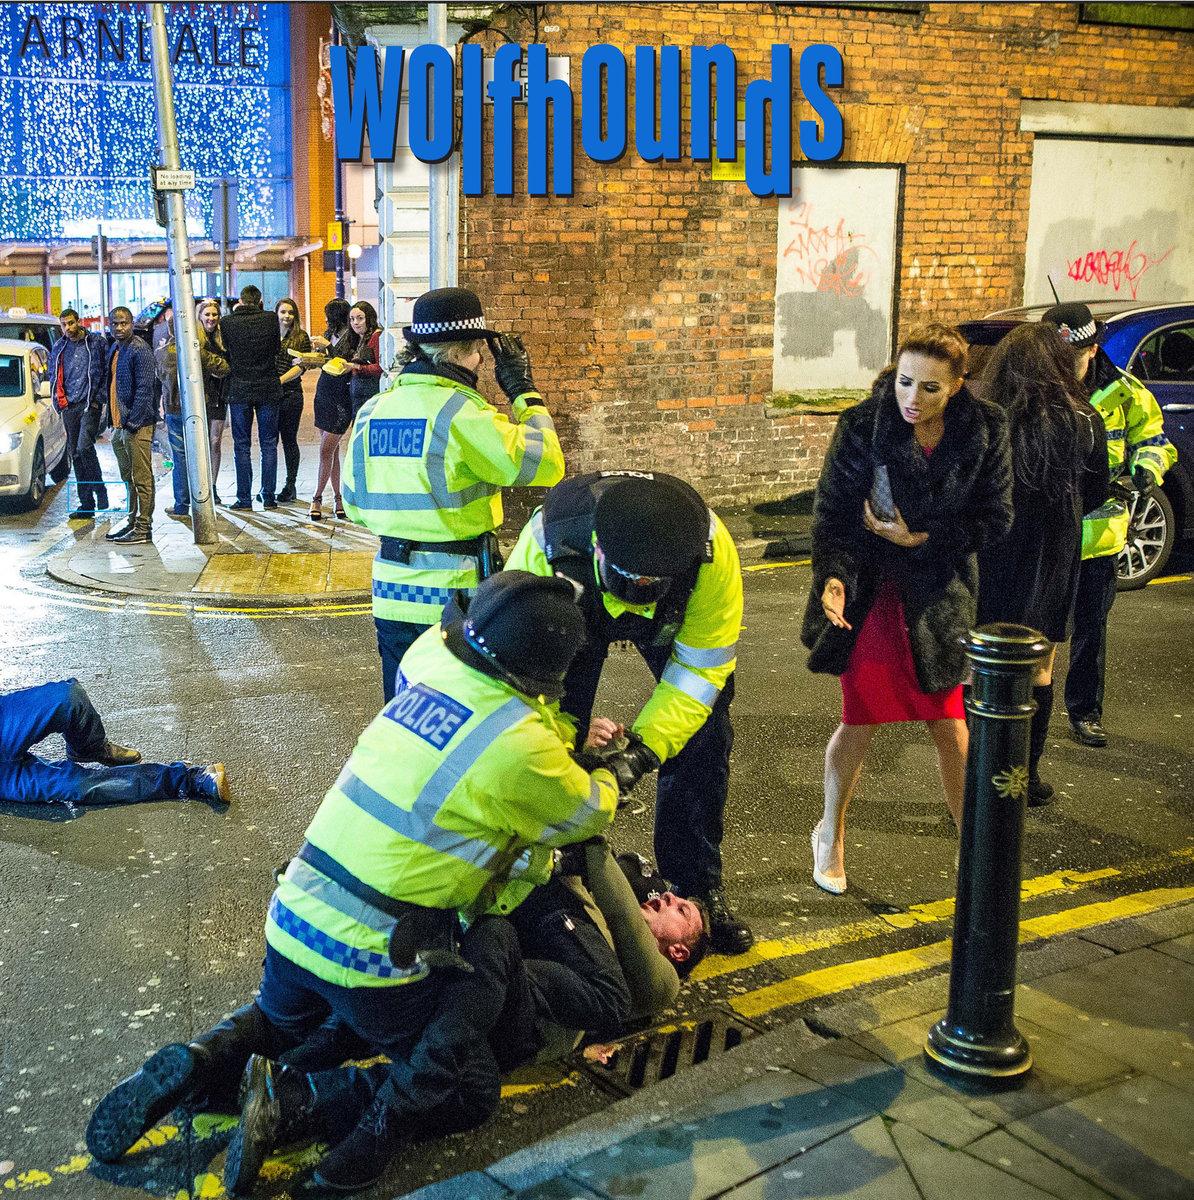 Wolfhounds - United Kingdom 2xLP